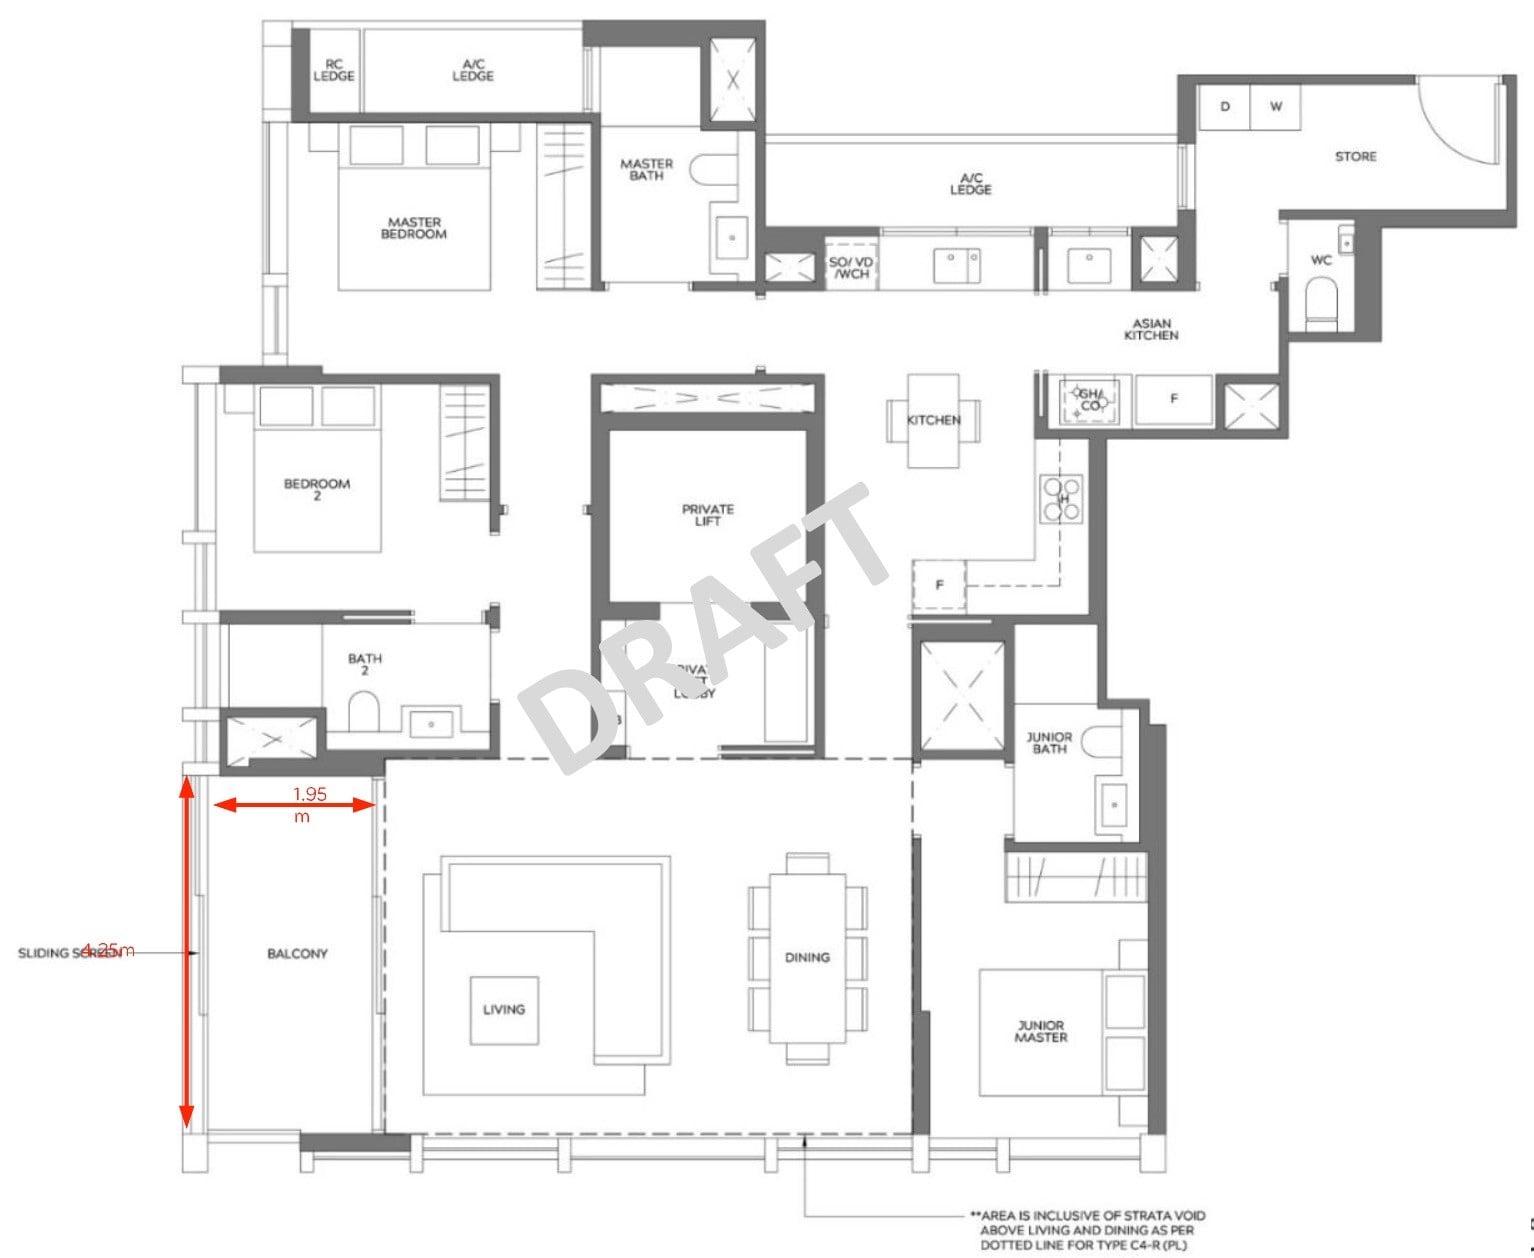 Meyer-Mansion-3BR type C4